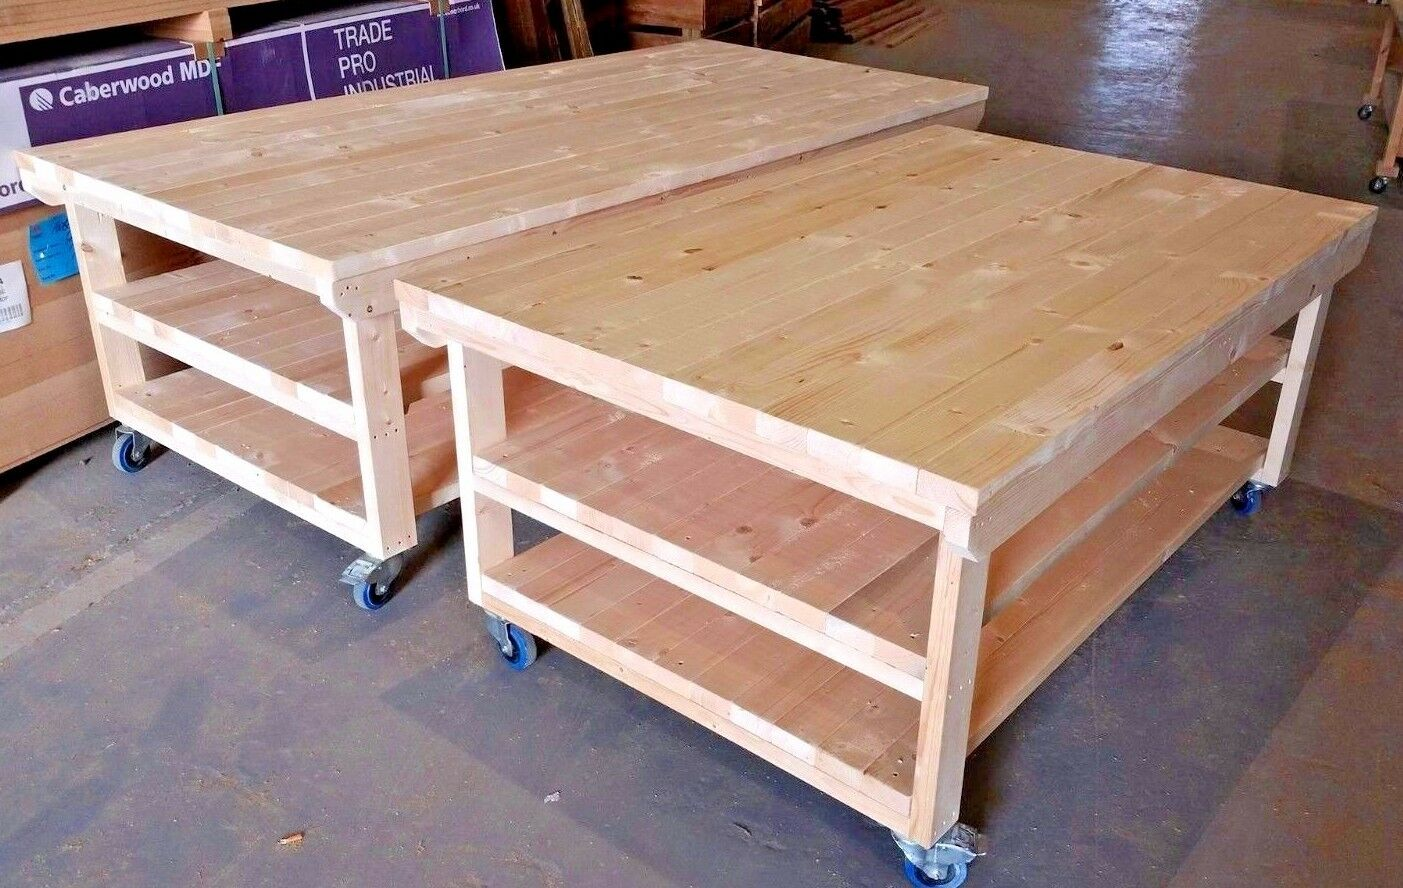 Workbench 4ft Wide With Wheels Wooden Industrial Garage